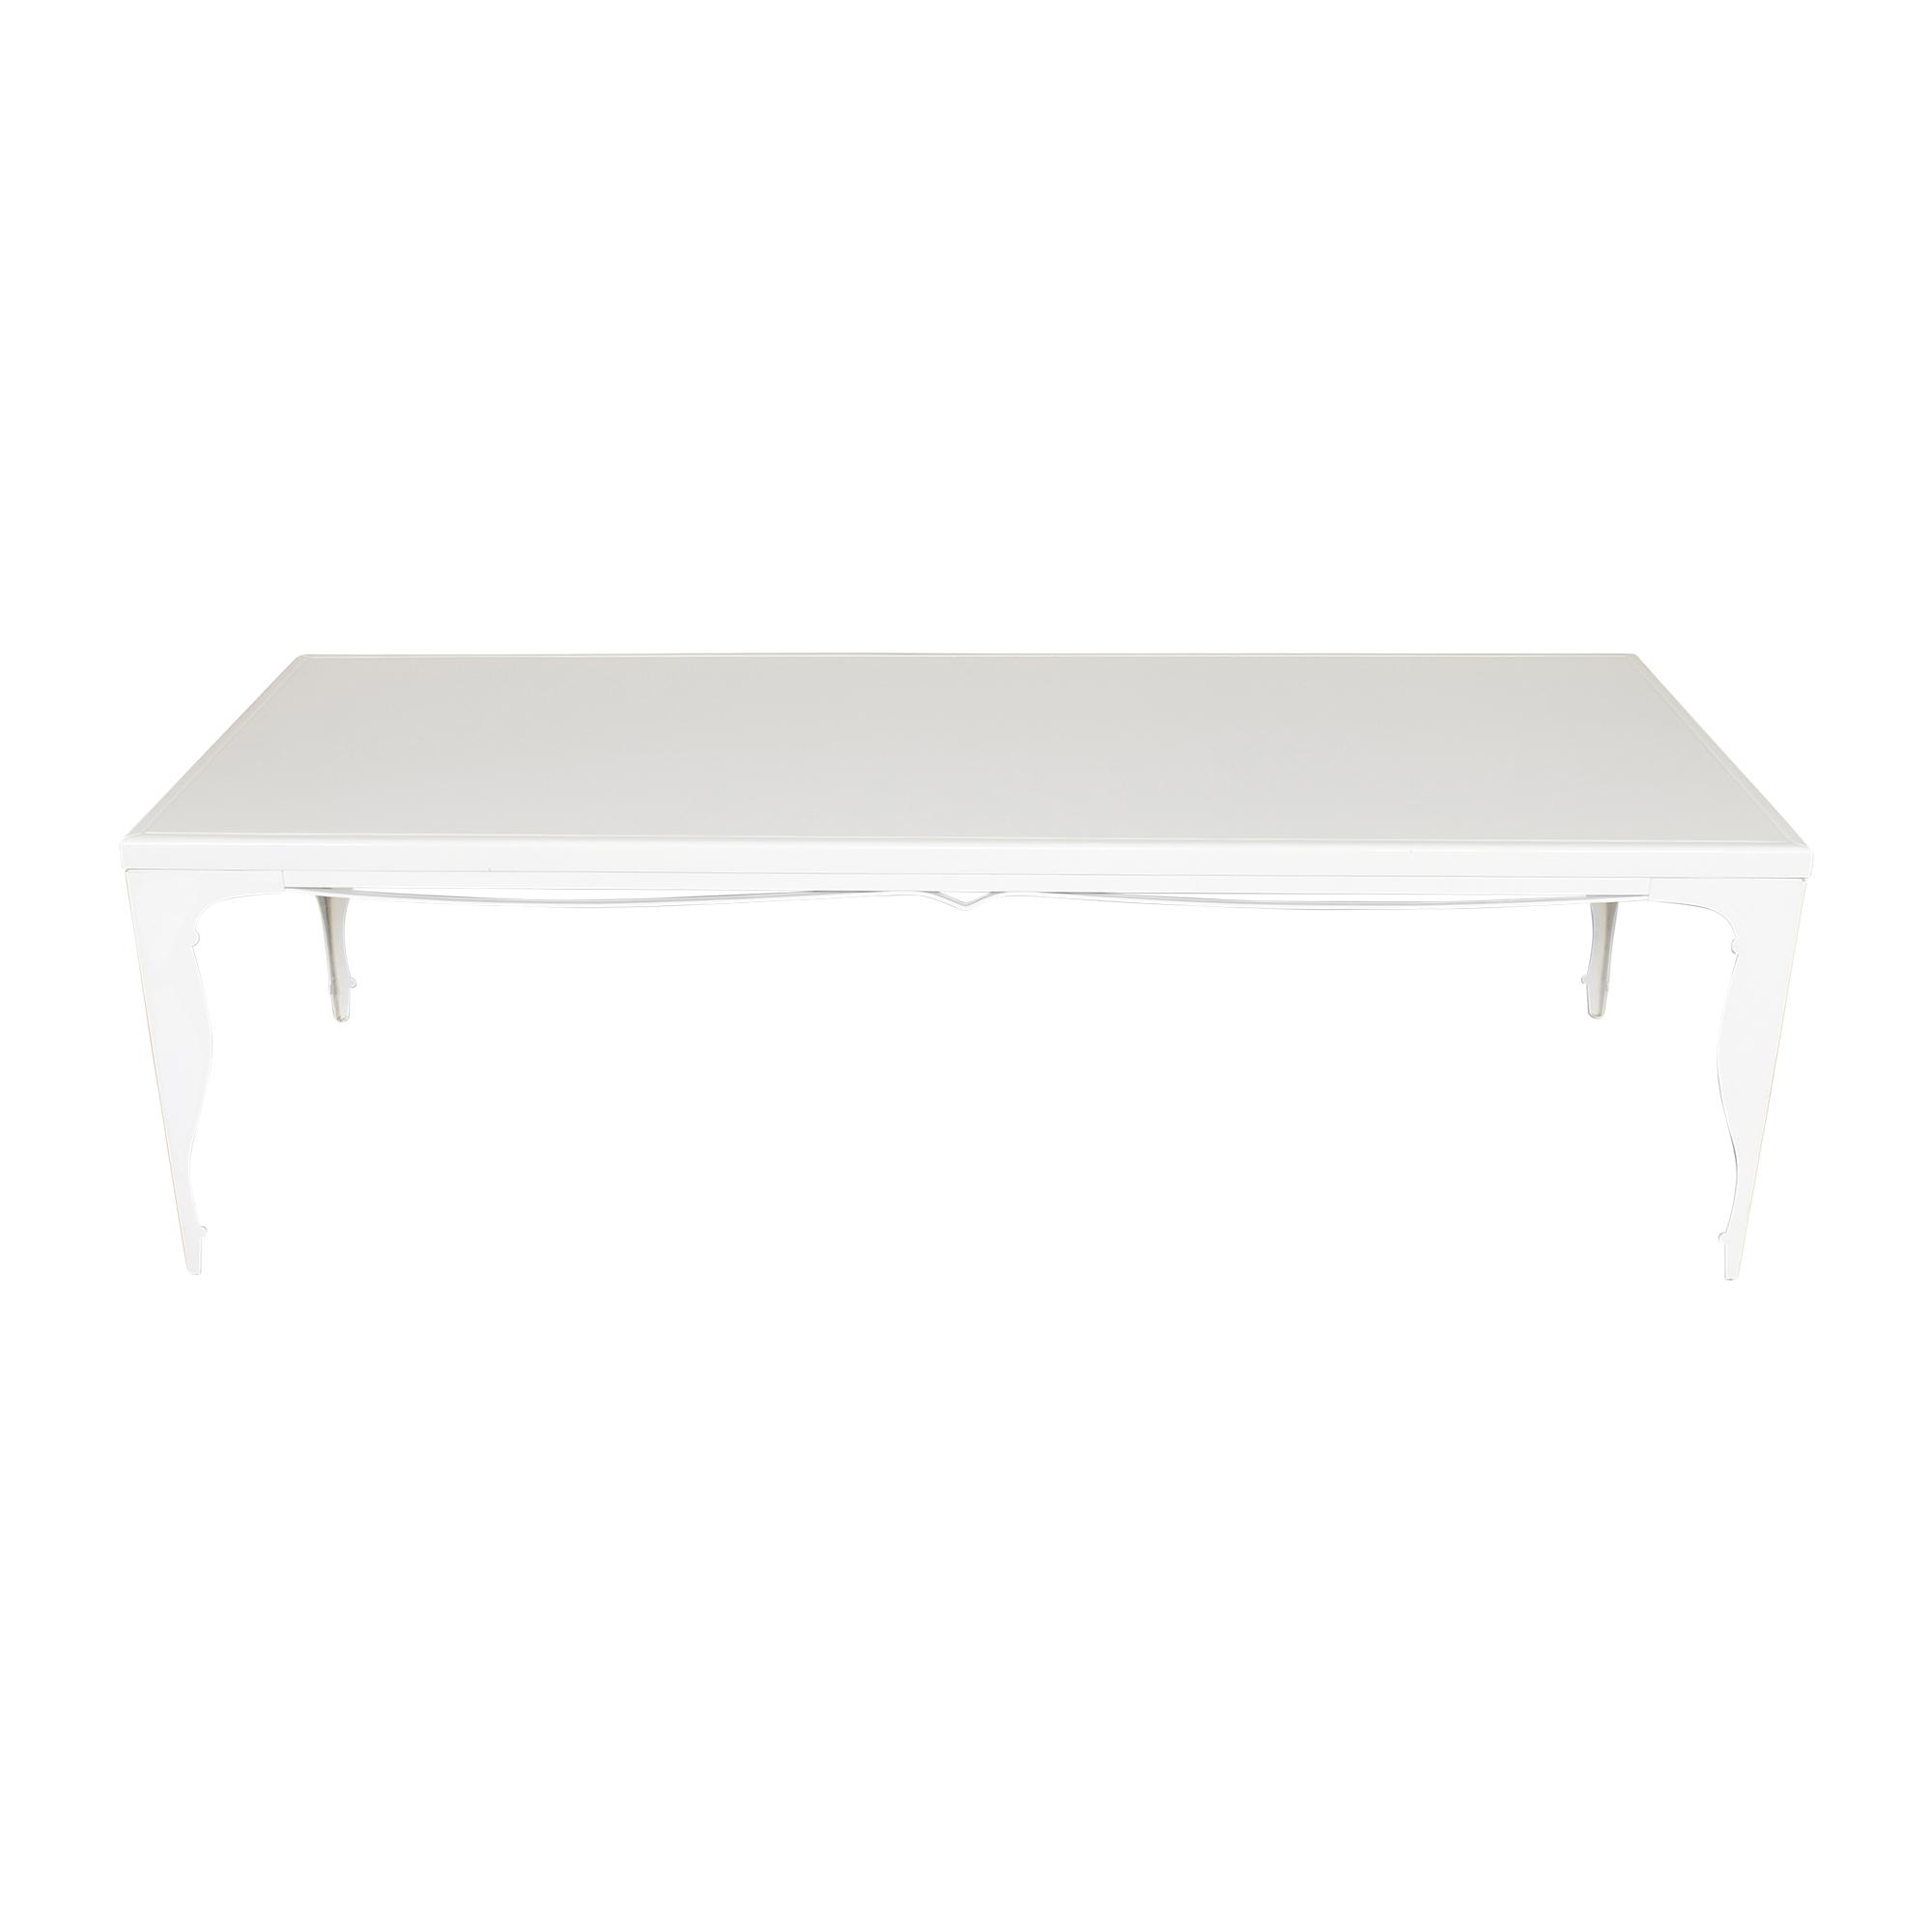 Modloft Modloft Rectangular Dining Table nyc